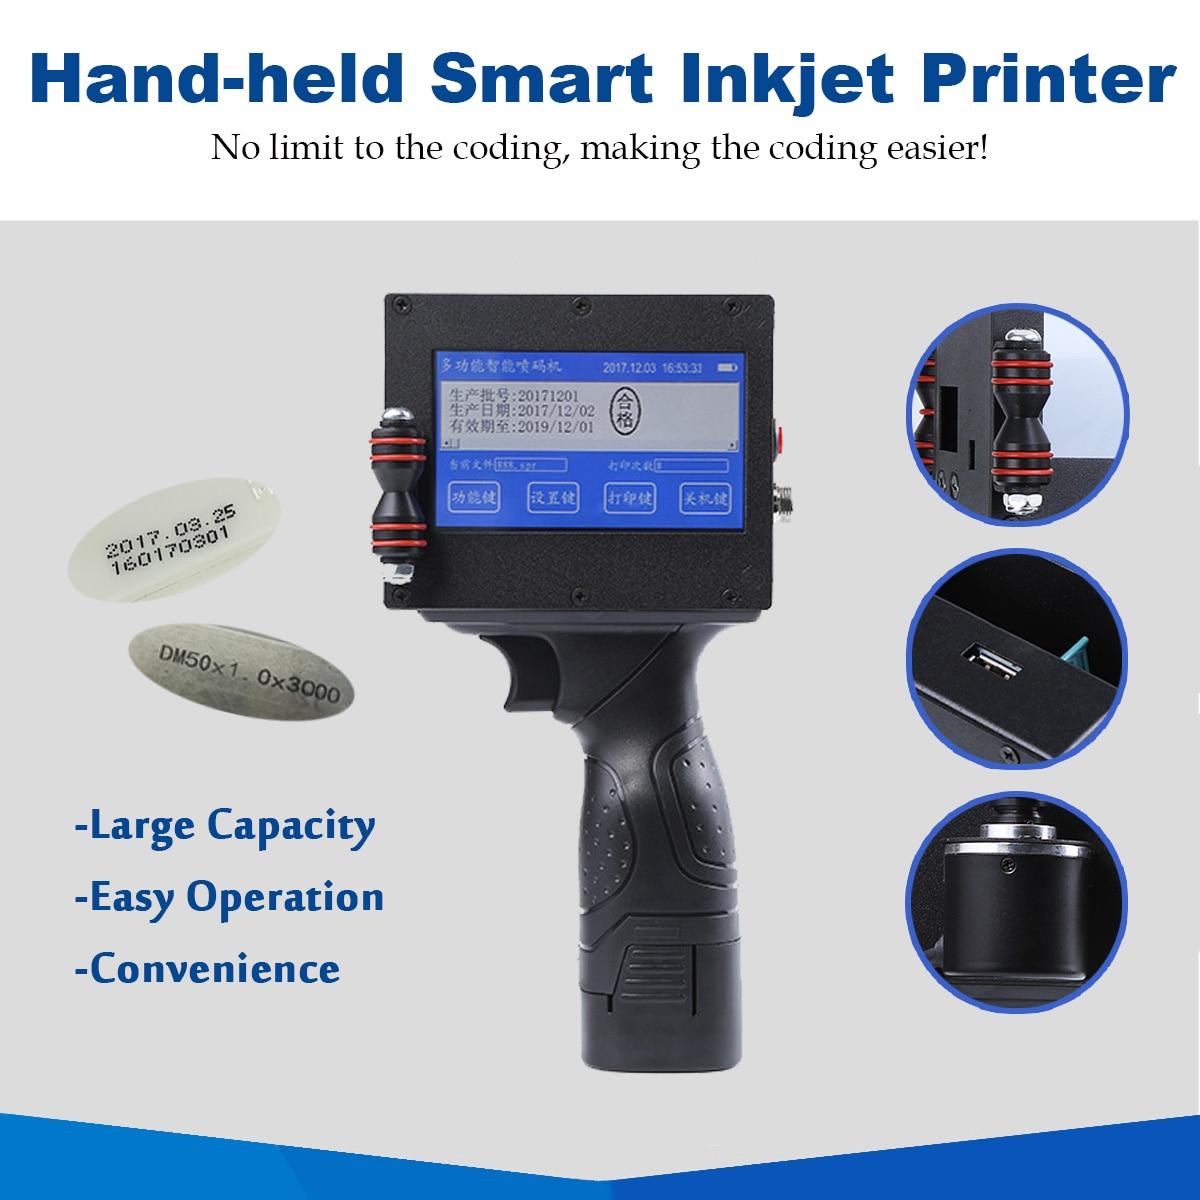 Aliexpress Com Buy Handheld Smart Date Coder Inkjet Printer Ink Rh Parts Catalogue Breakdown: Denso 468100 5092 Wiring Diagram At Shintaries.co